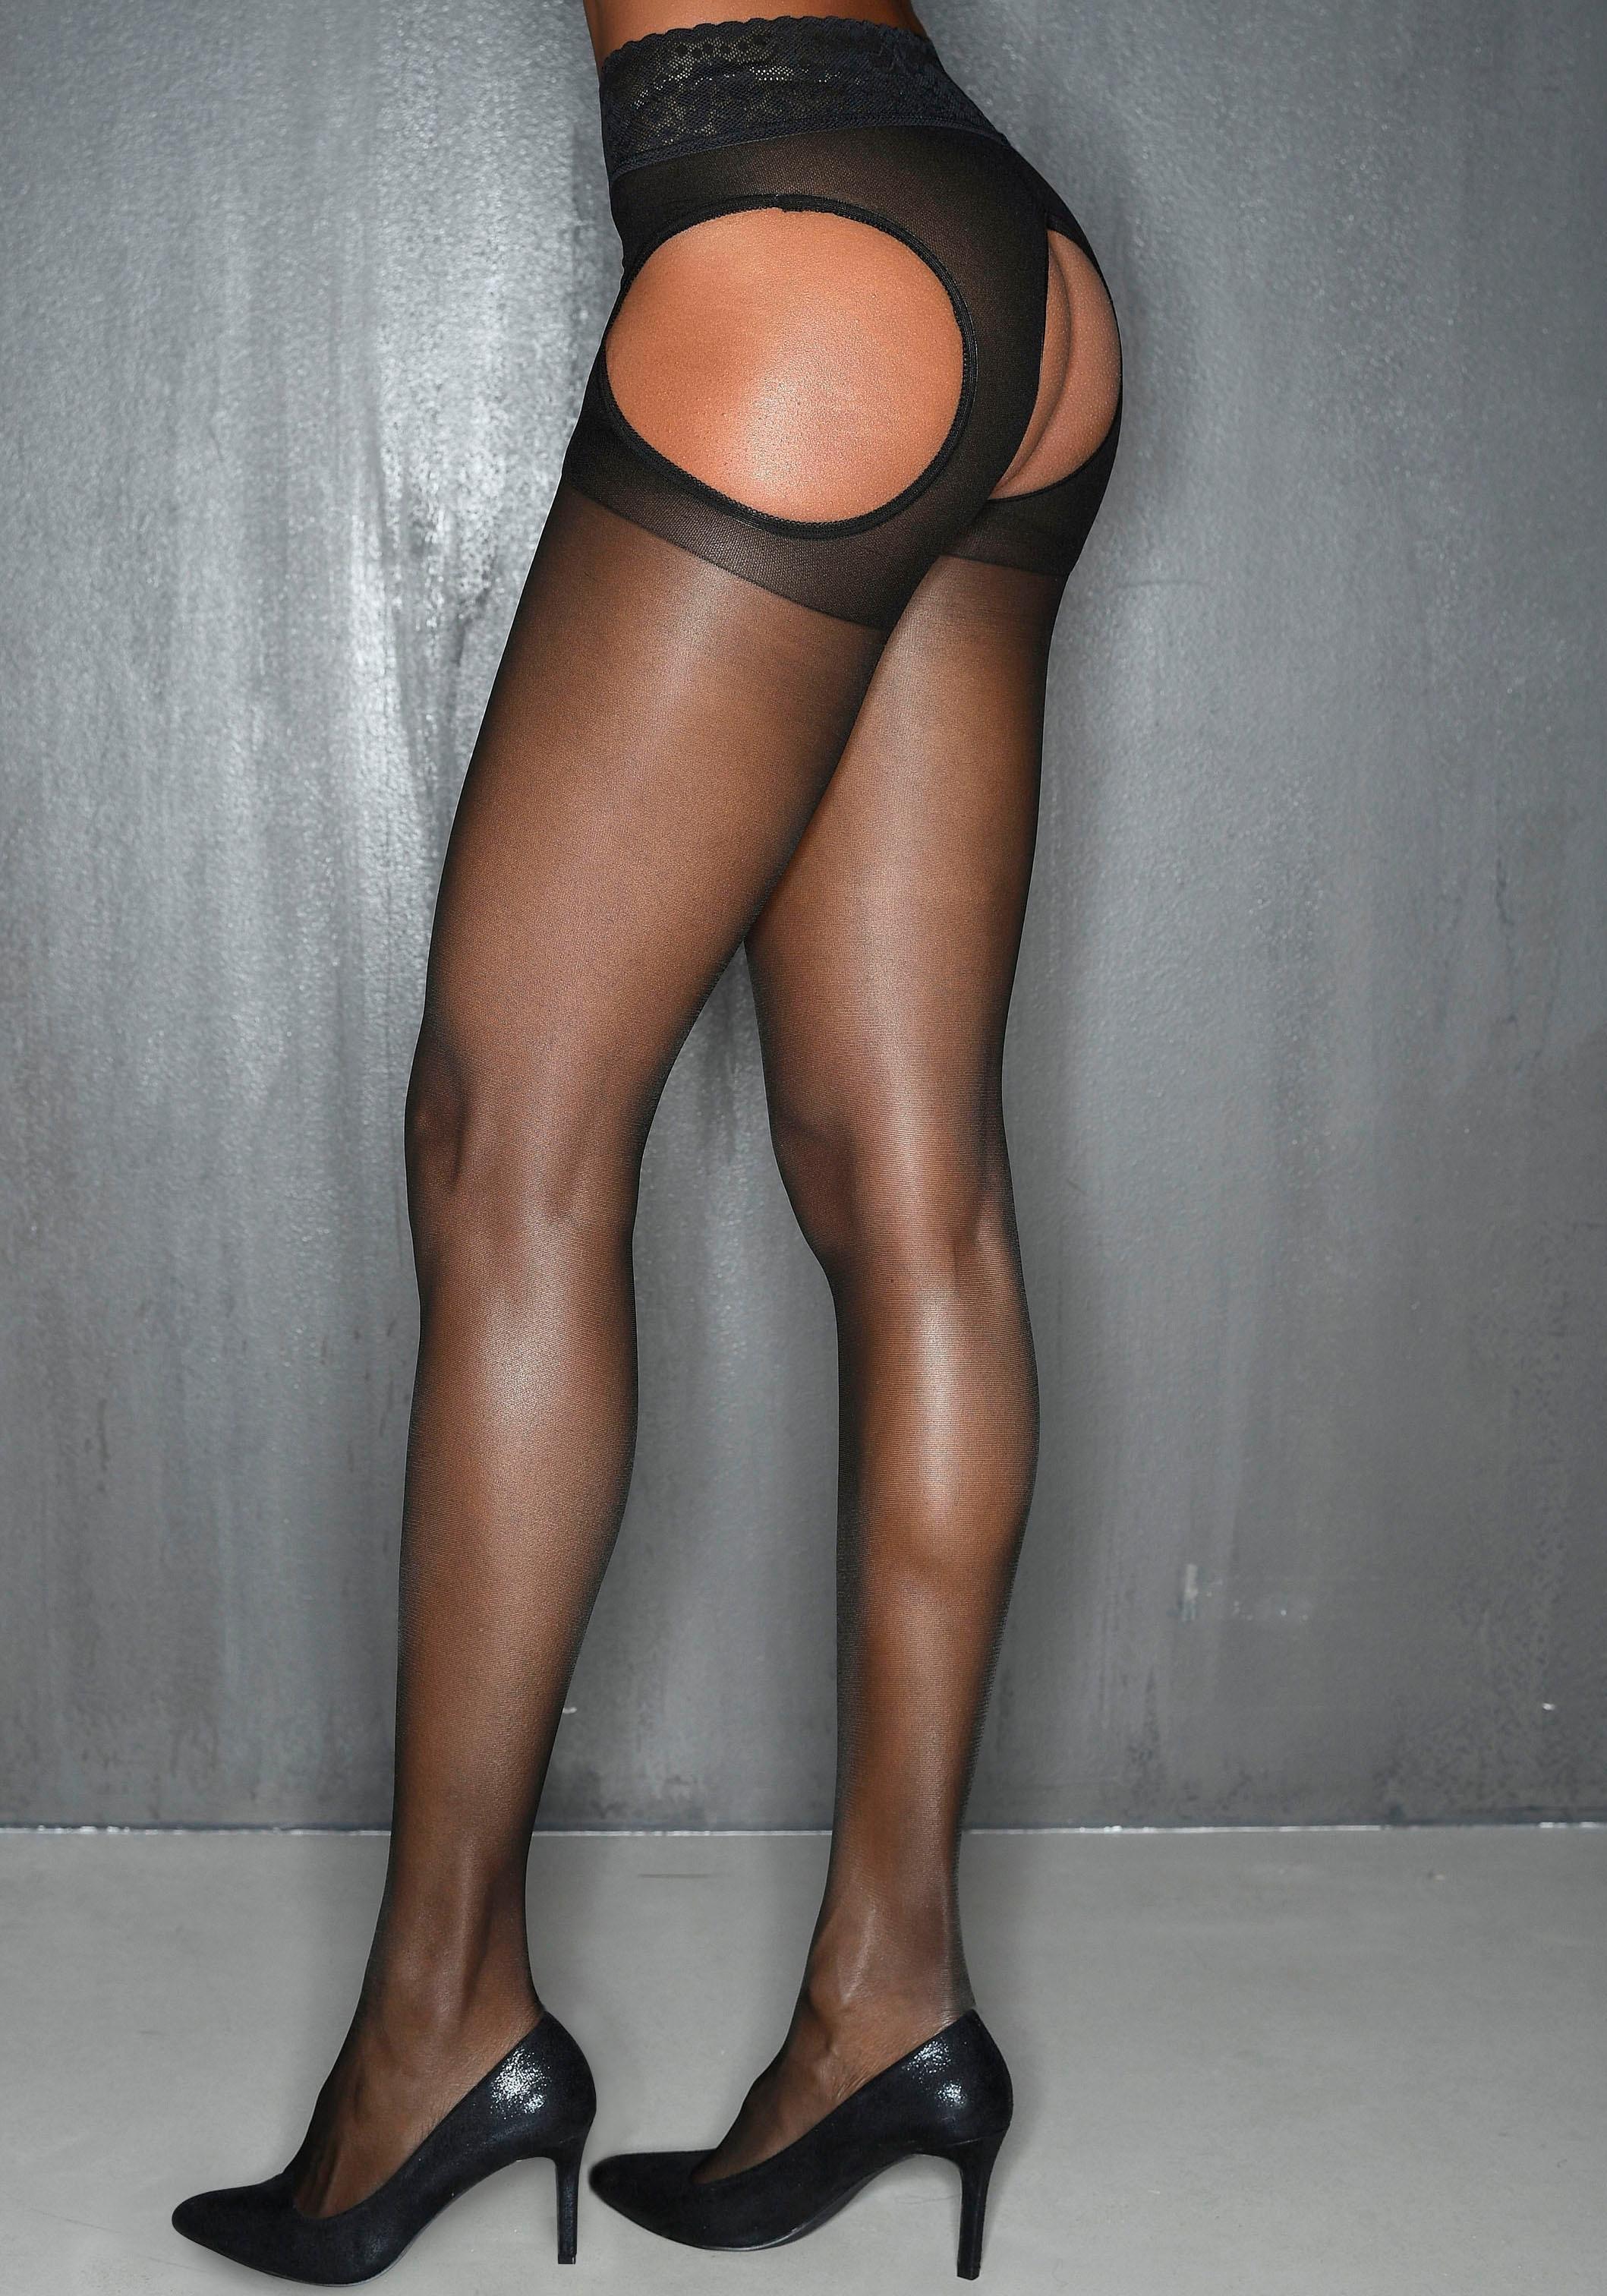 Petite fleur gold panty 15 DEN bij Lascana online kopen